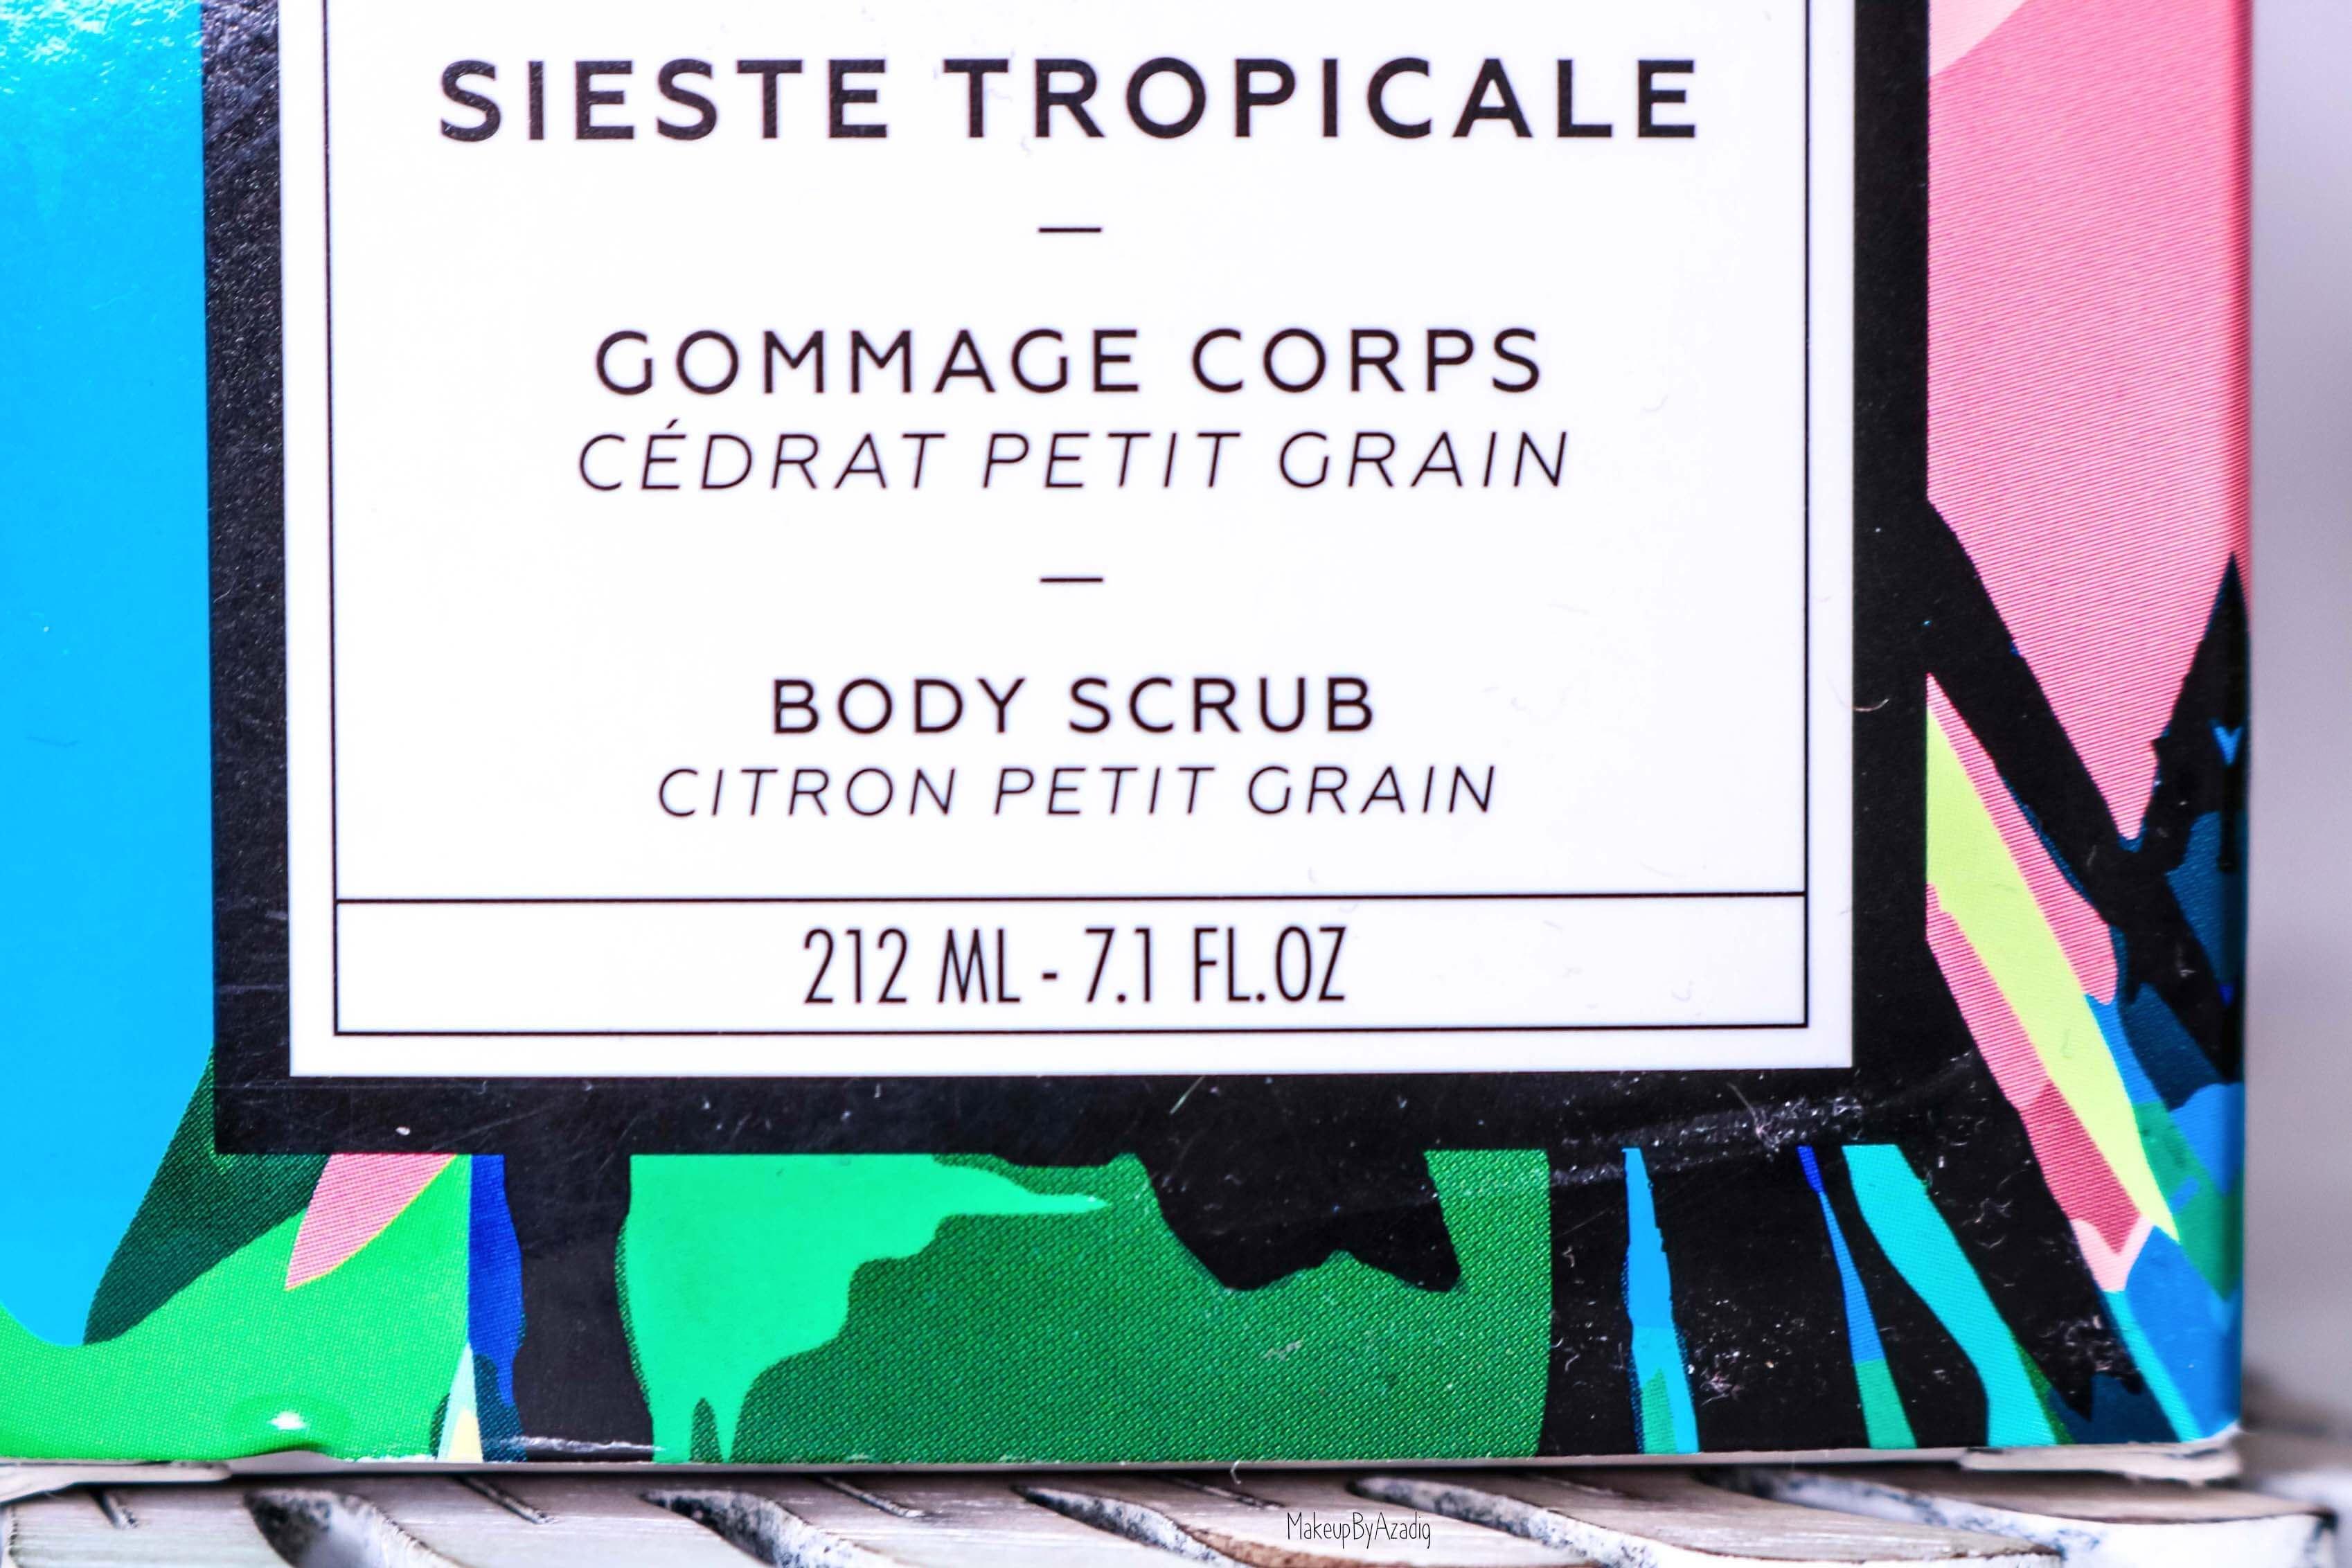 revue-collection-sieste-tropicale-baija--cedrat-paris-corps-bougie-gommage-soin-citron-makeupbyazadig-avis-prix-sephora-scrub